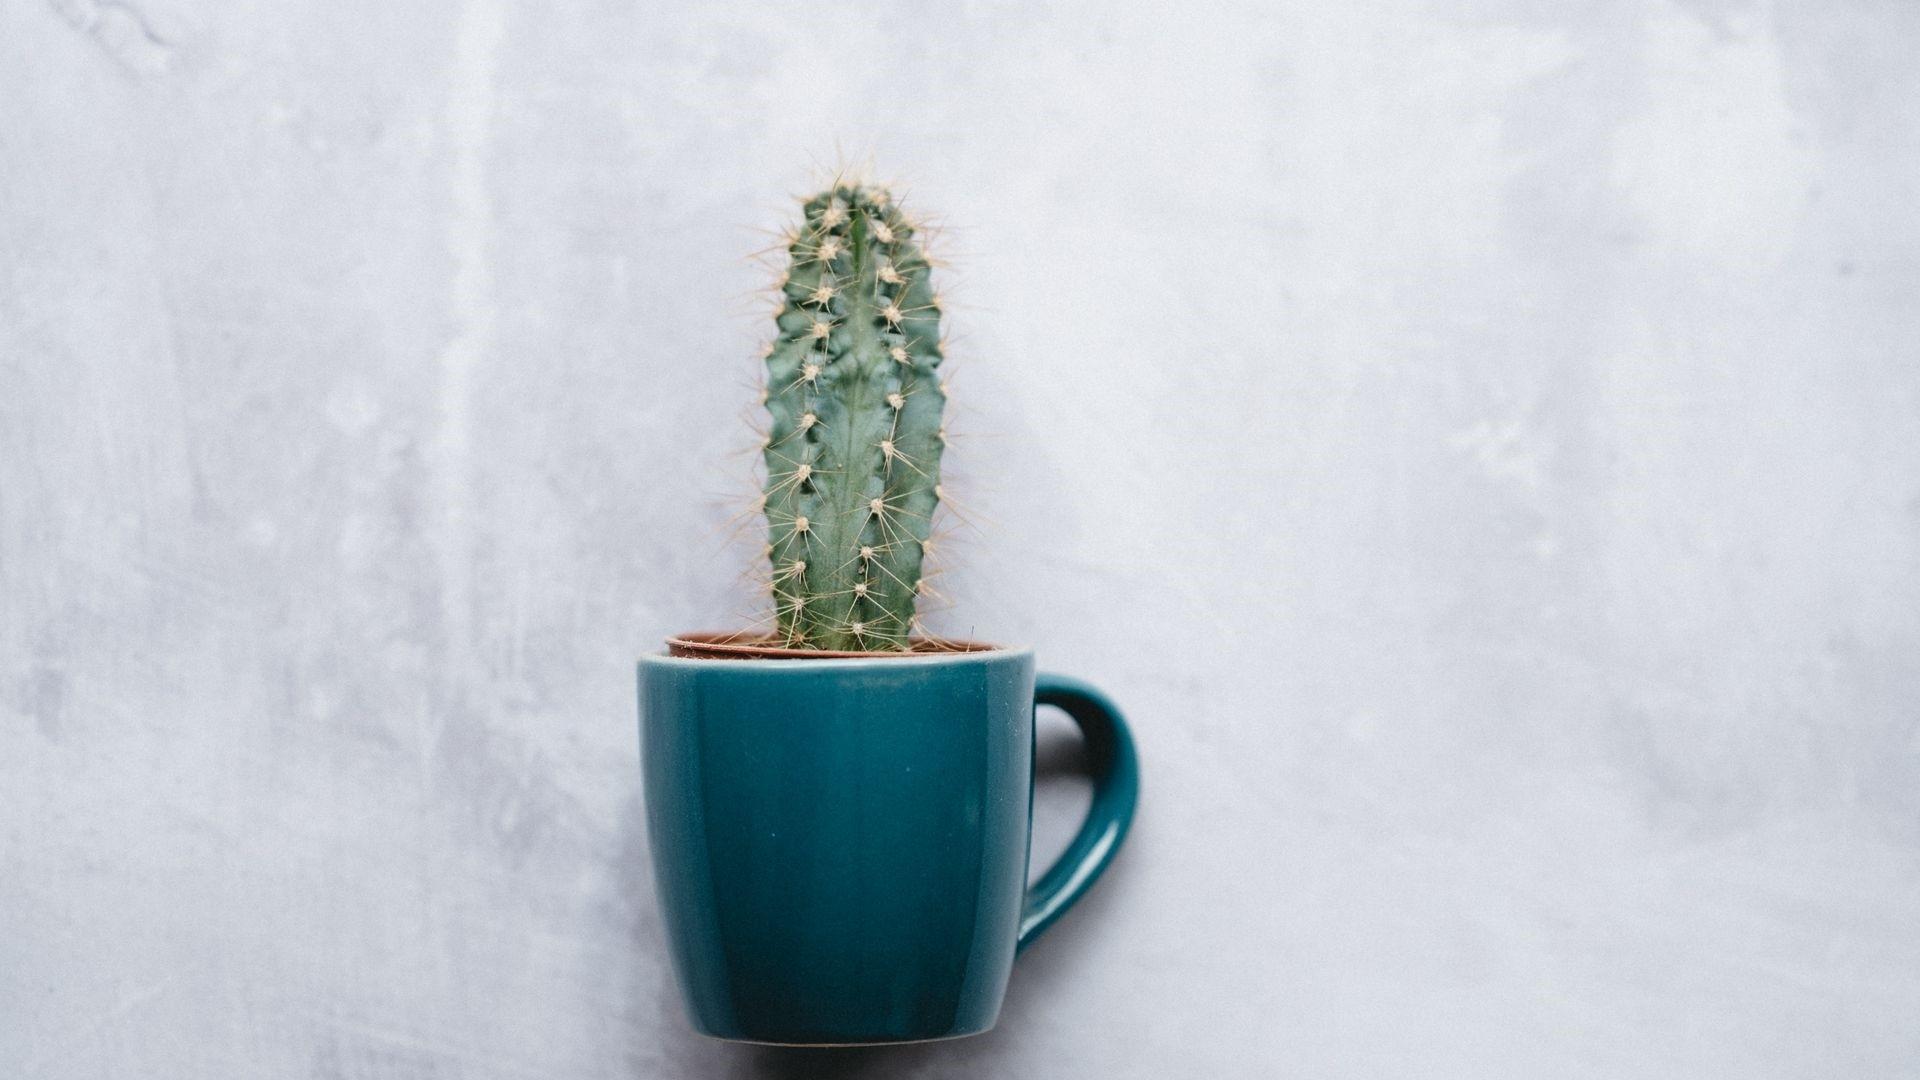 Cactus Minimalist wallpaper for desktop